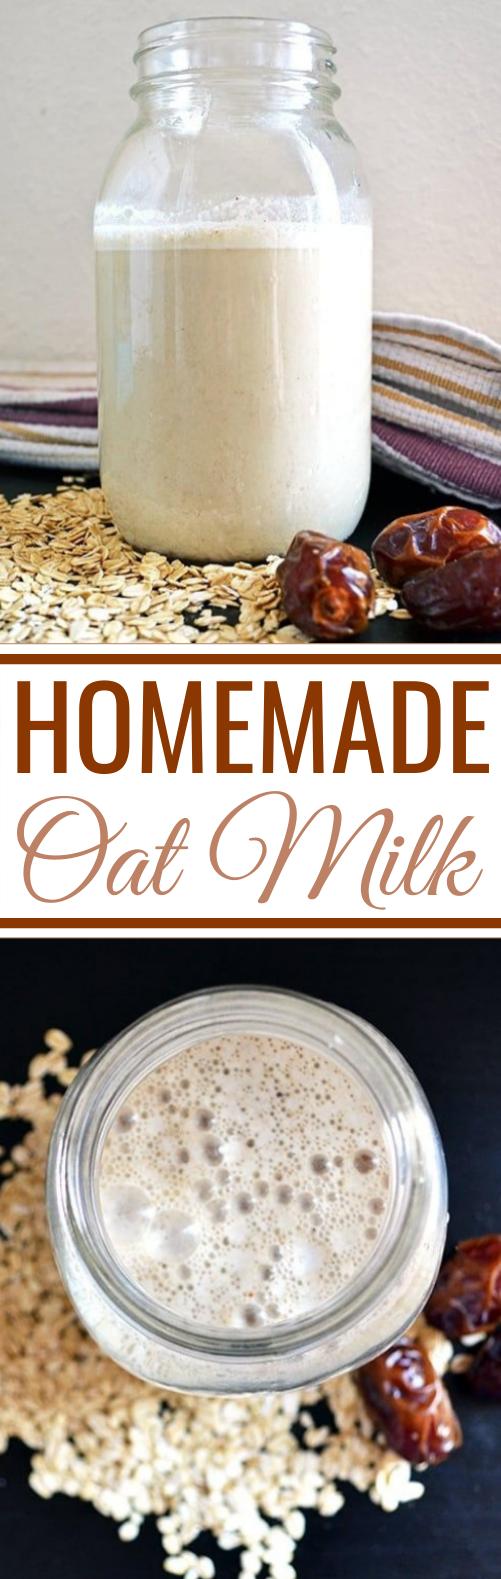 Homemade Oat Milk #healthy #drinks #milk #vegan #breakfast